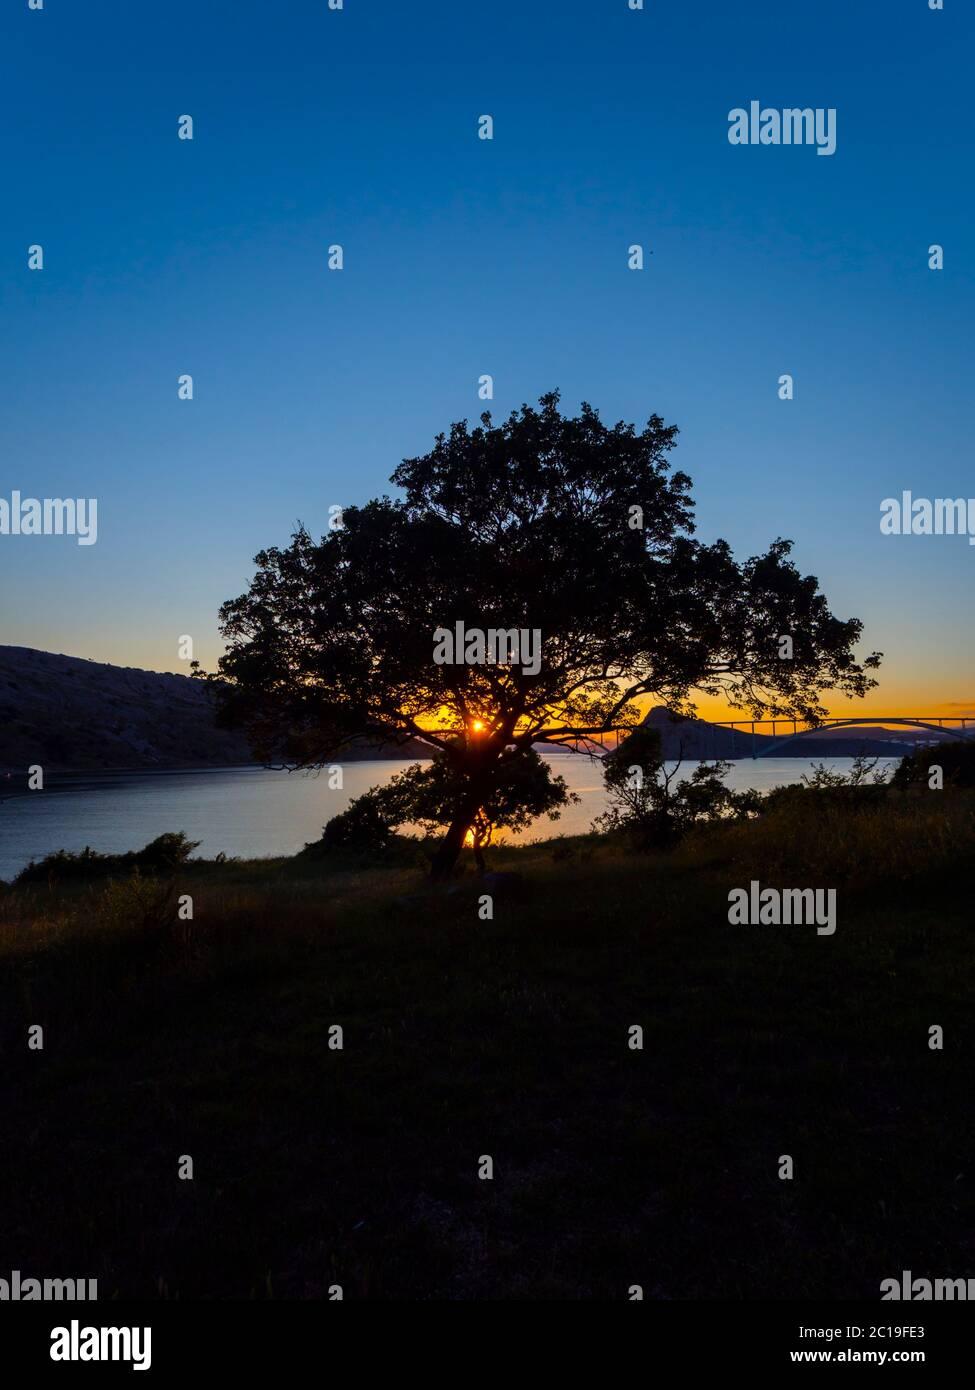 Sunset landscape bridge mainland to island Krk Croatia see view through dominant tree Stock Photo